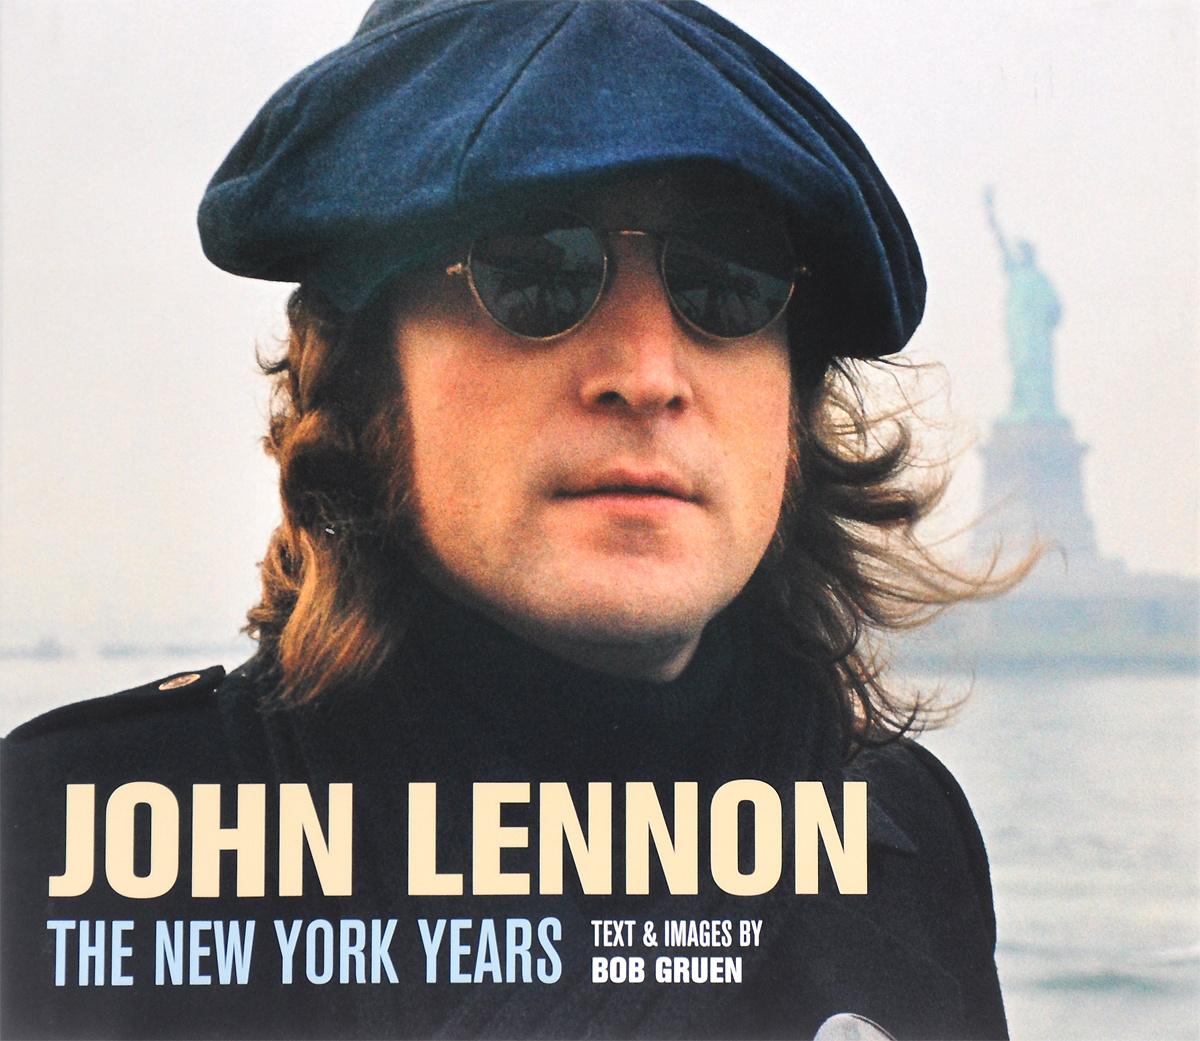 John Lennon: The New York Years | Gruen Bob #1